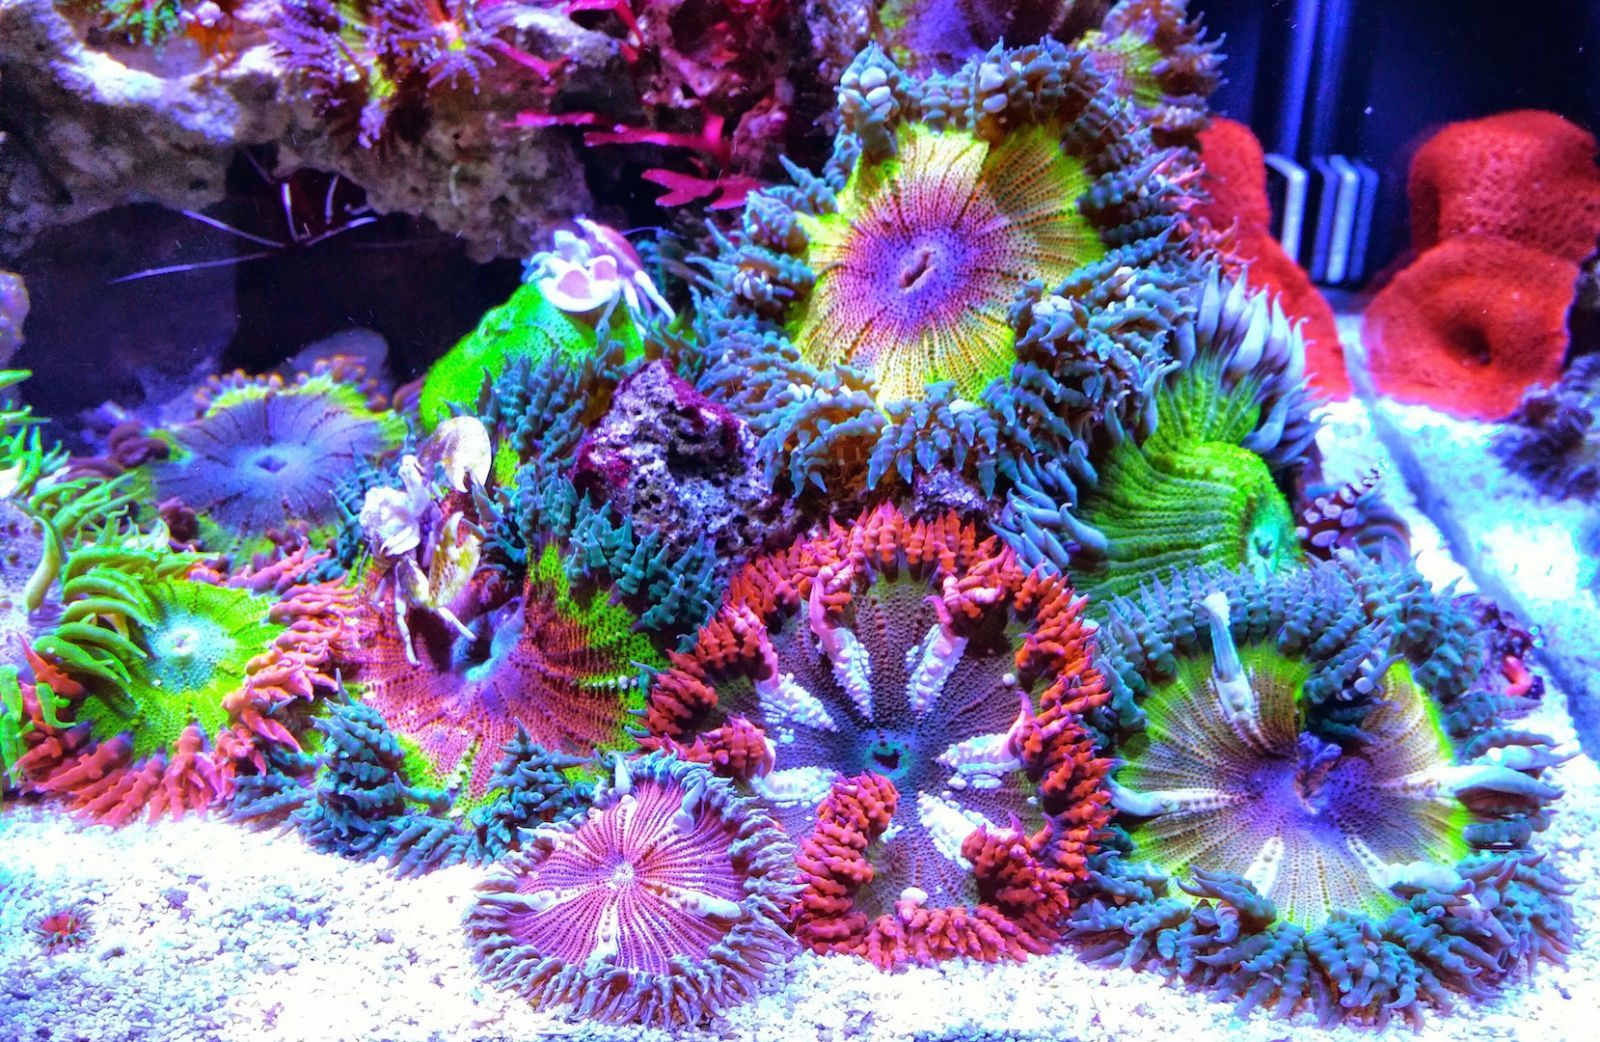 Rock Flower Anemone Garden Invertebrates Gallery Saltwater Fish Tanks Saltwater Aquarium Fish Coral Reef Aquarium